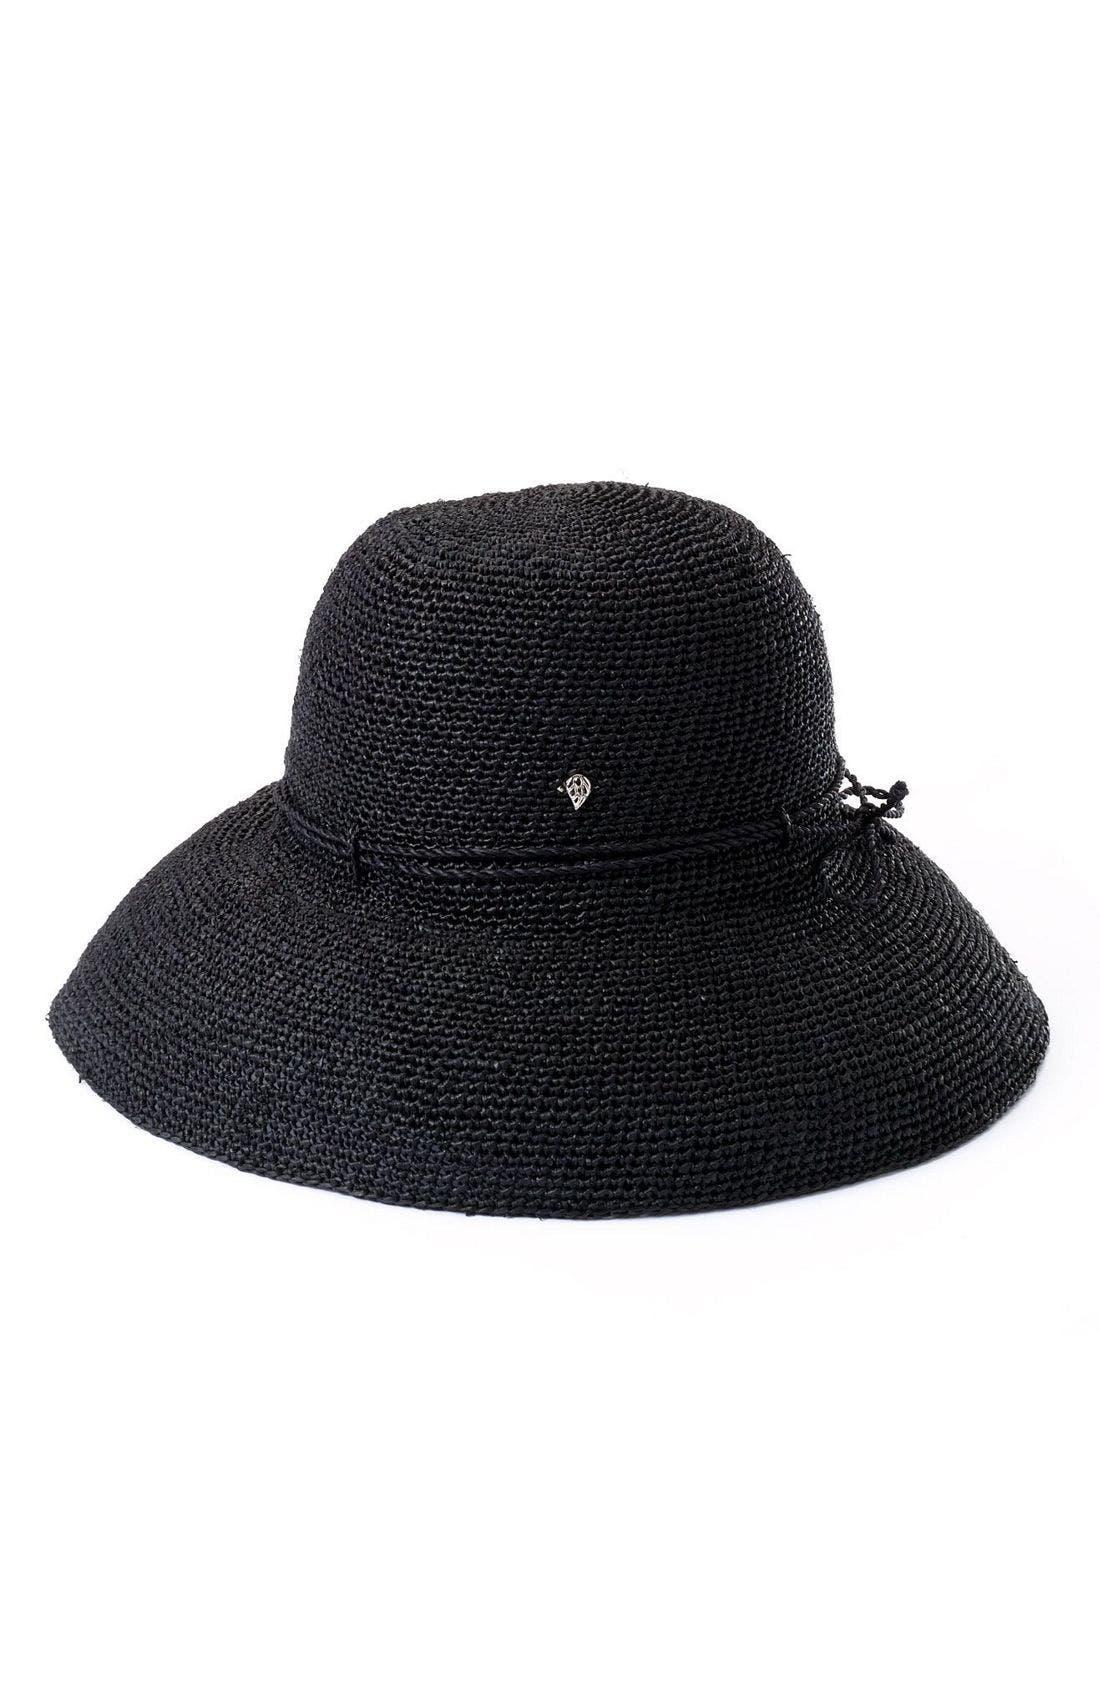 Hats for Women  b80dc7757a0